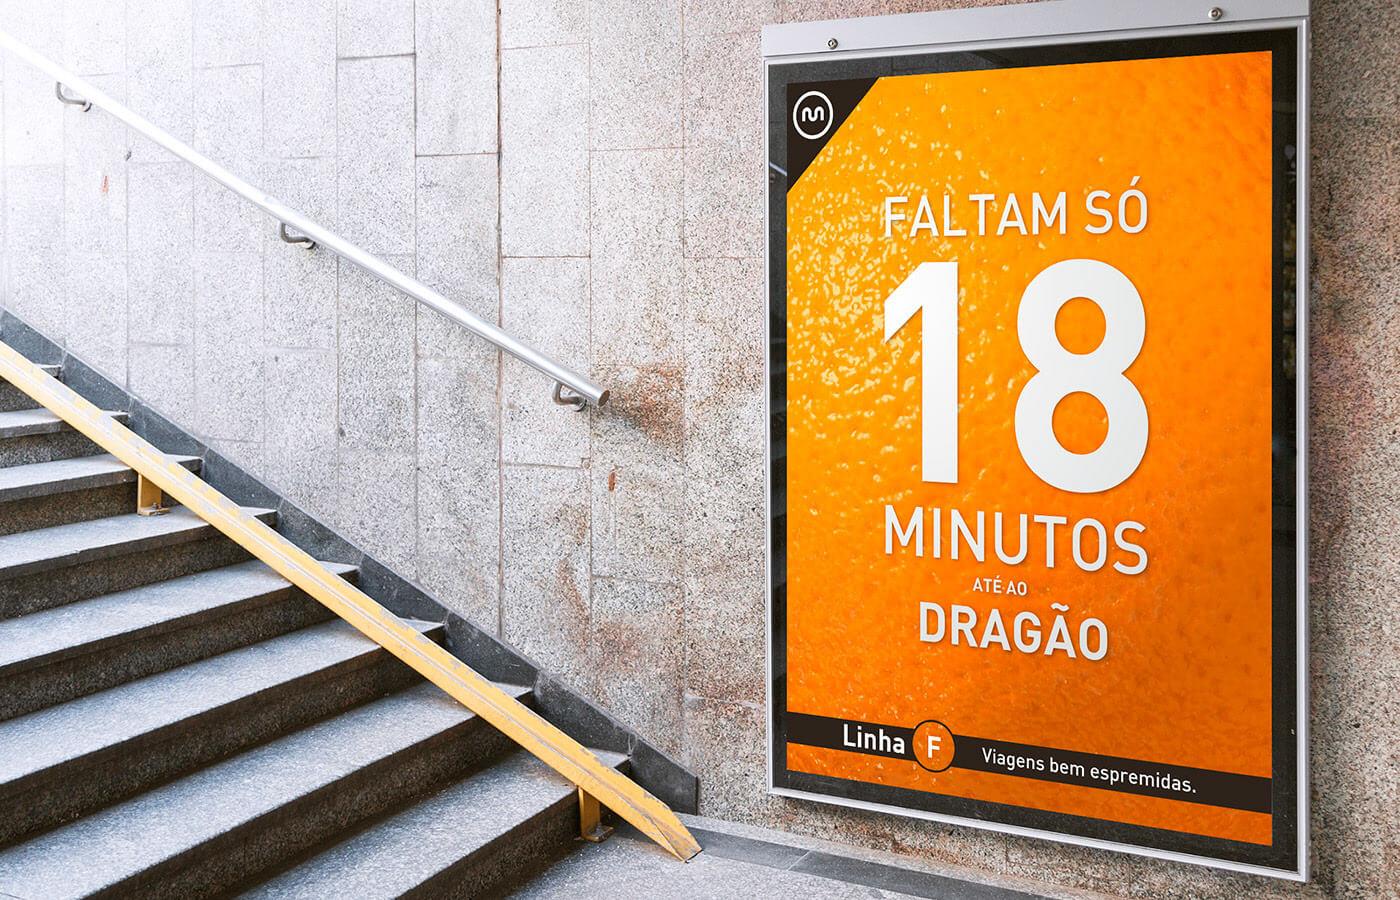 Metro do Porto, Linha Laranja, subway, orange line